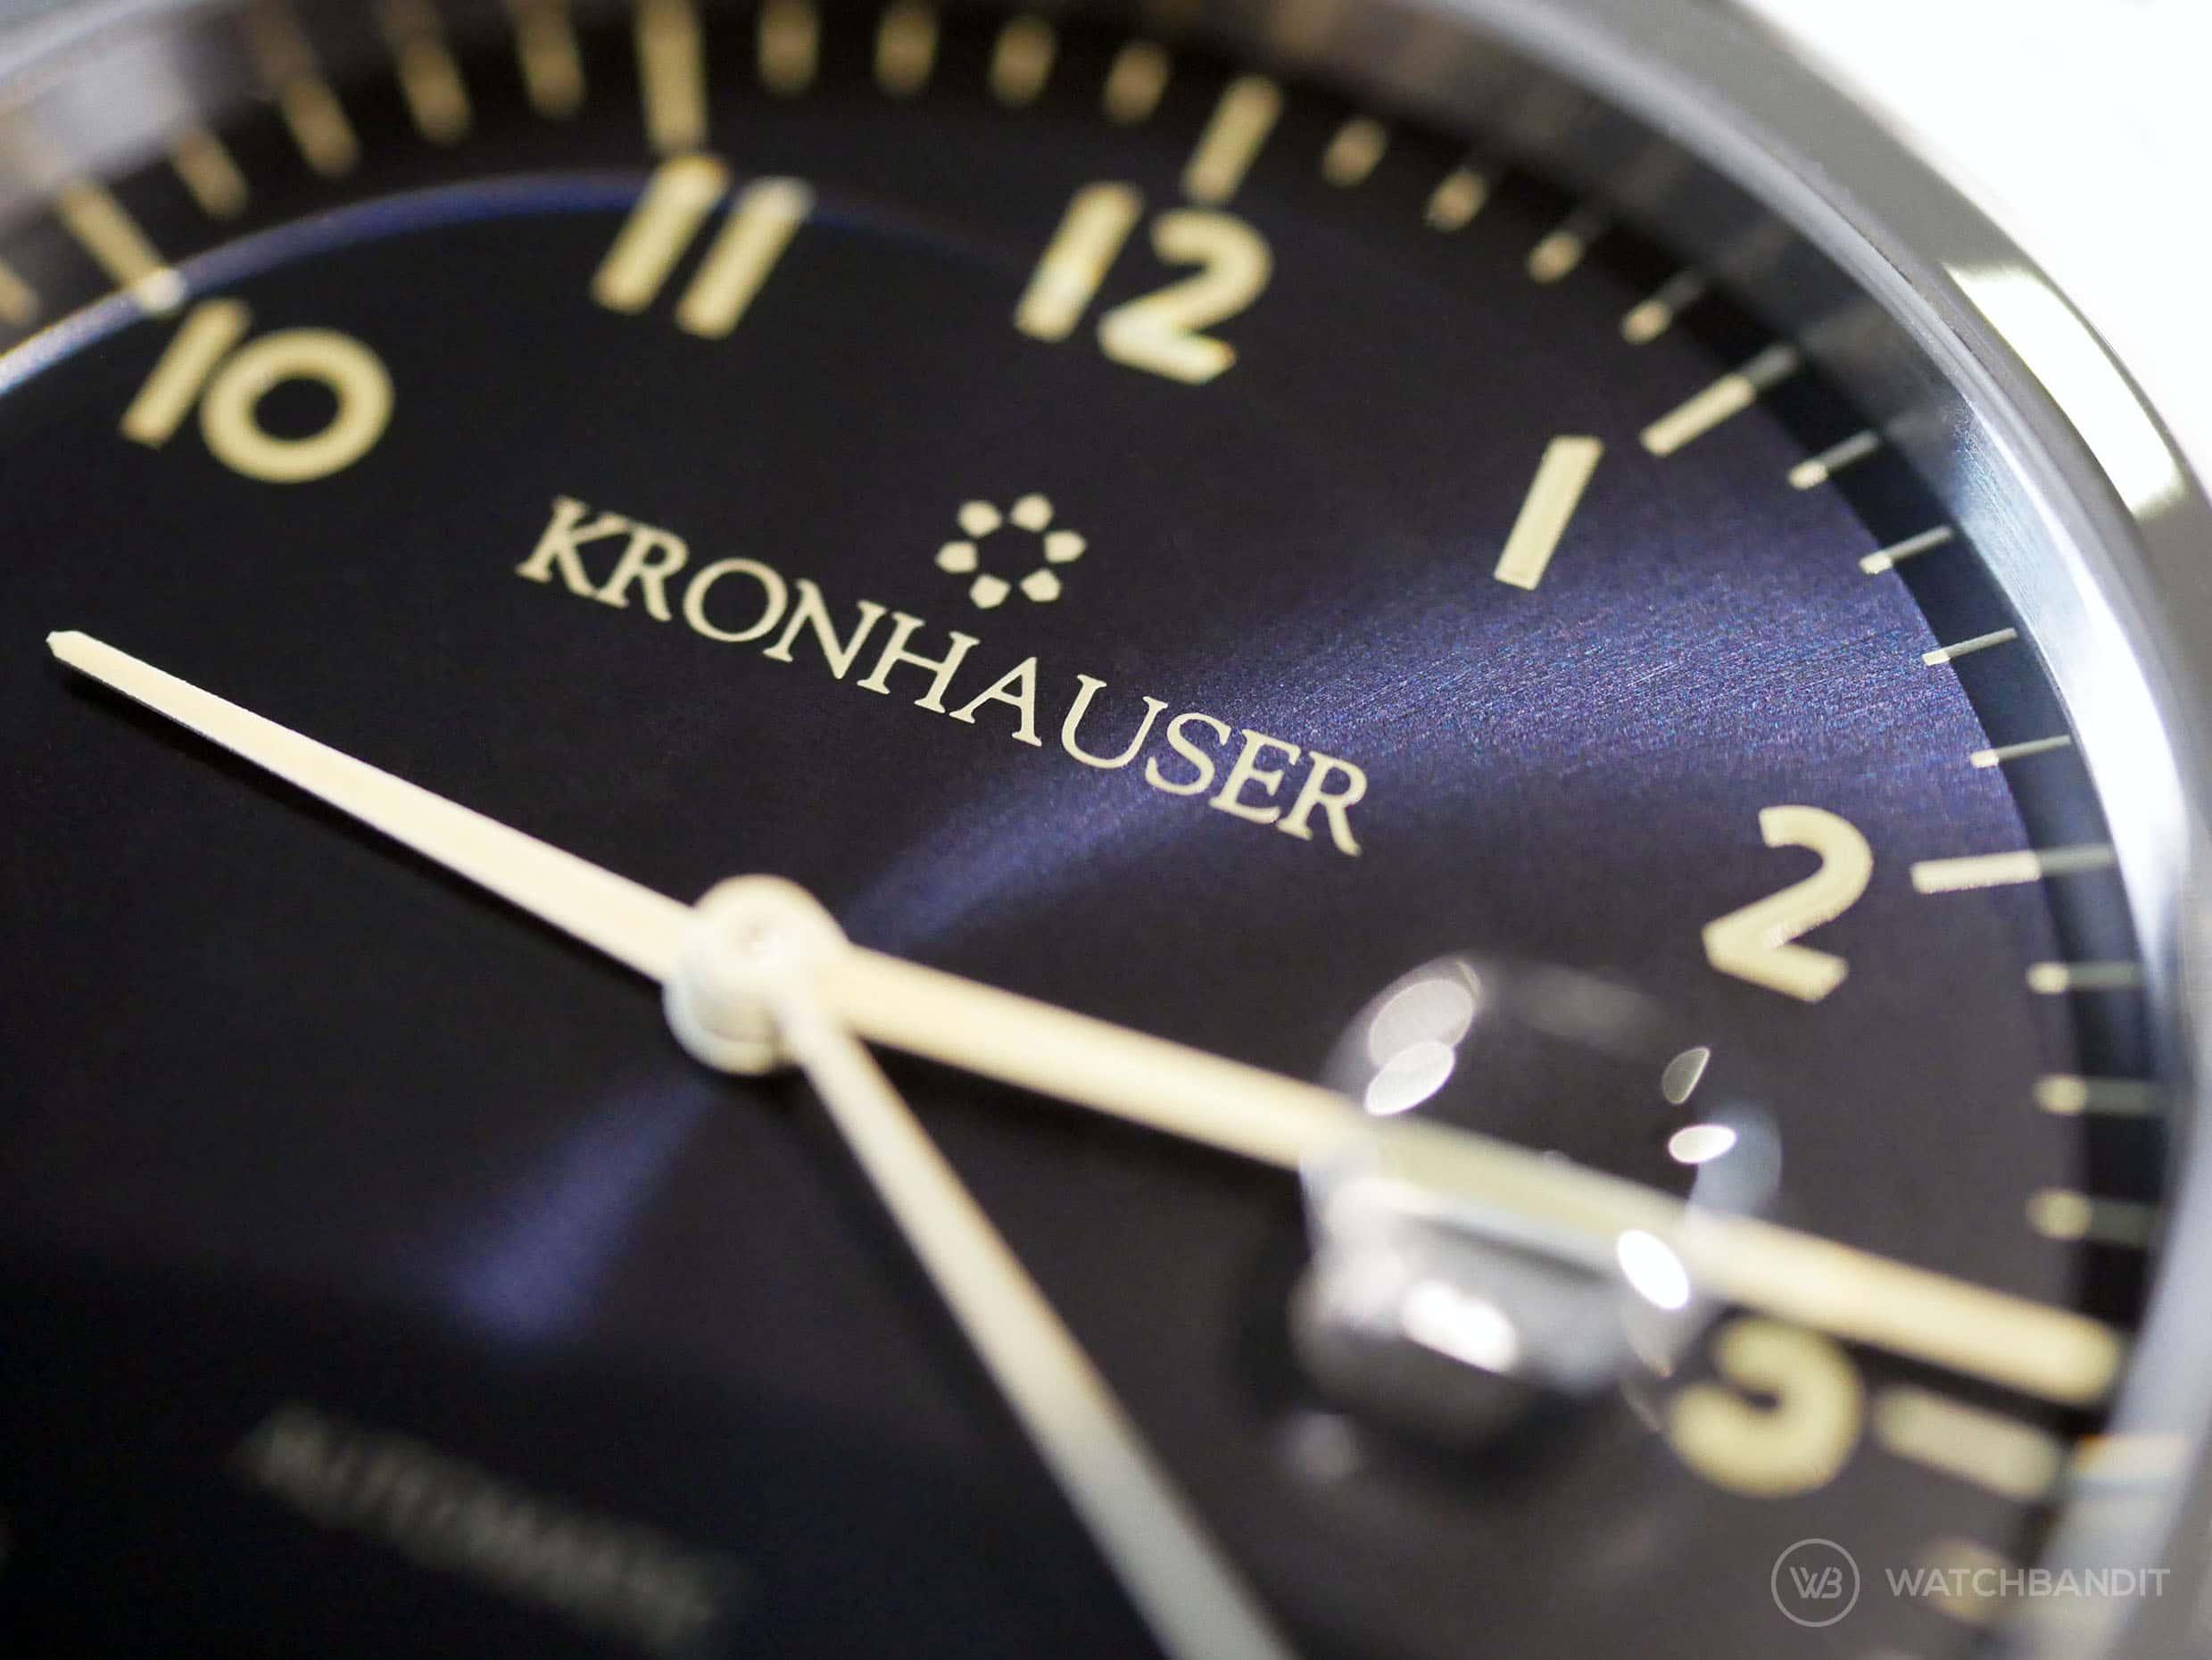 Kronhauser Blue Sunburst Dial